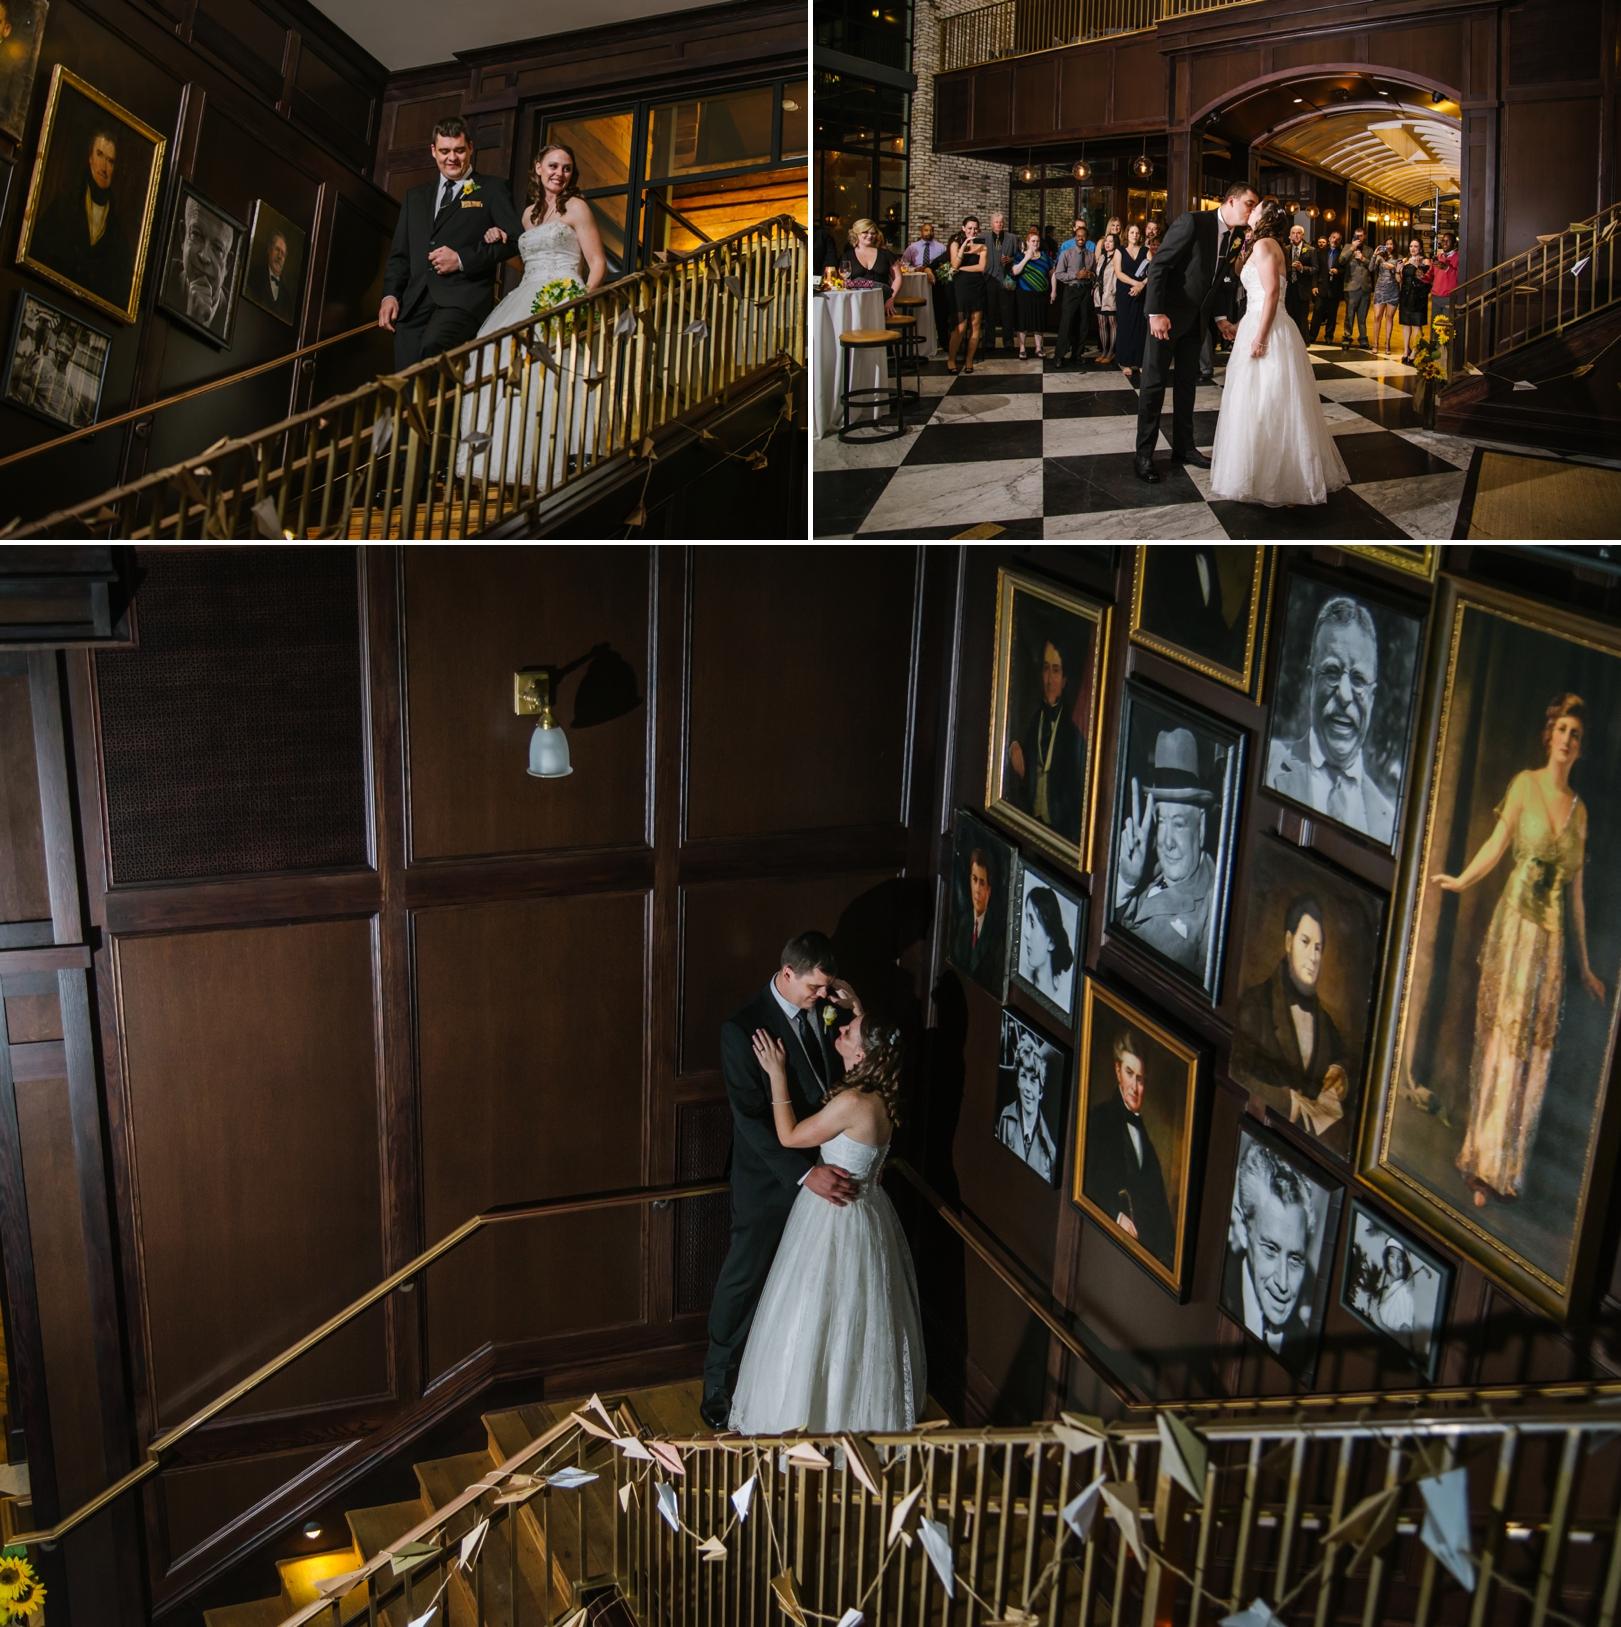 tampa-wedding-photographer-oxford-exchange_0019.jpg